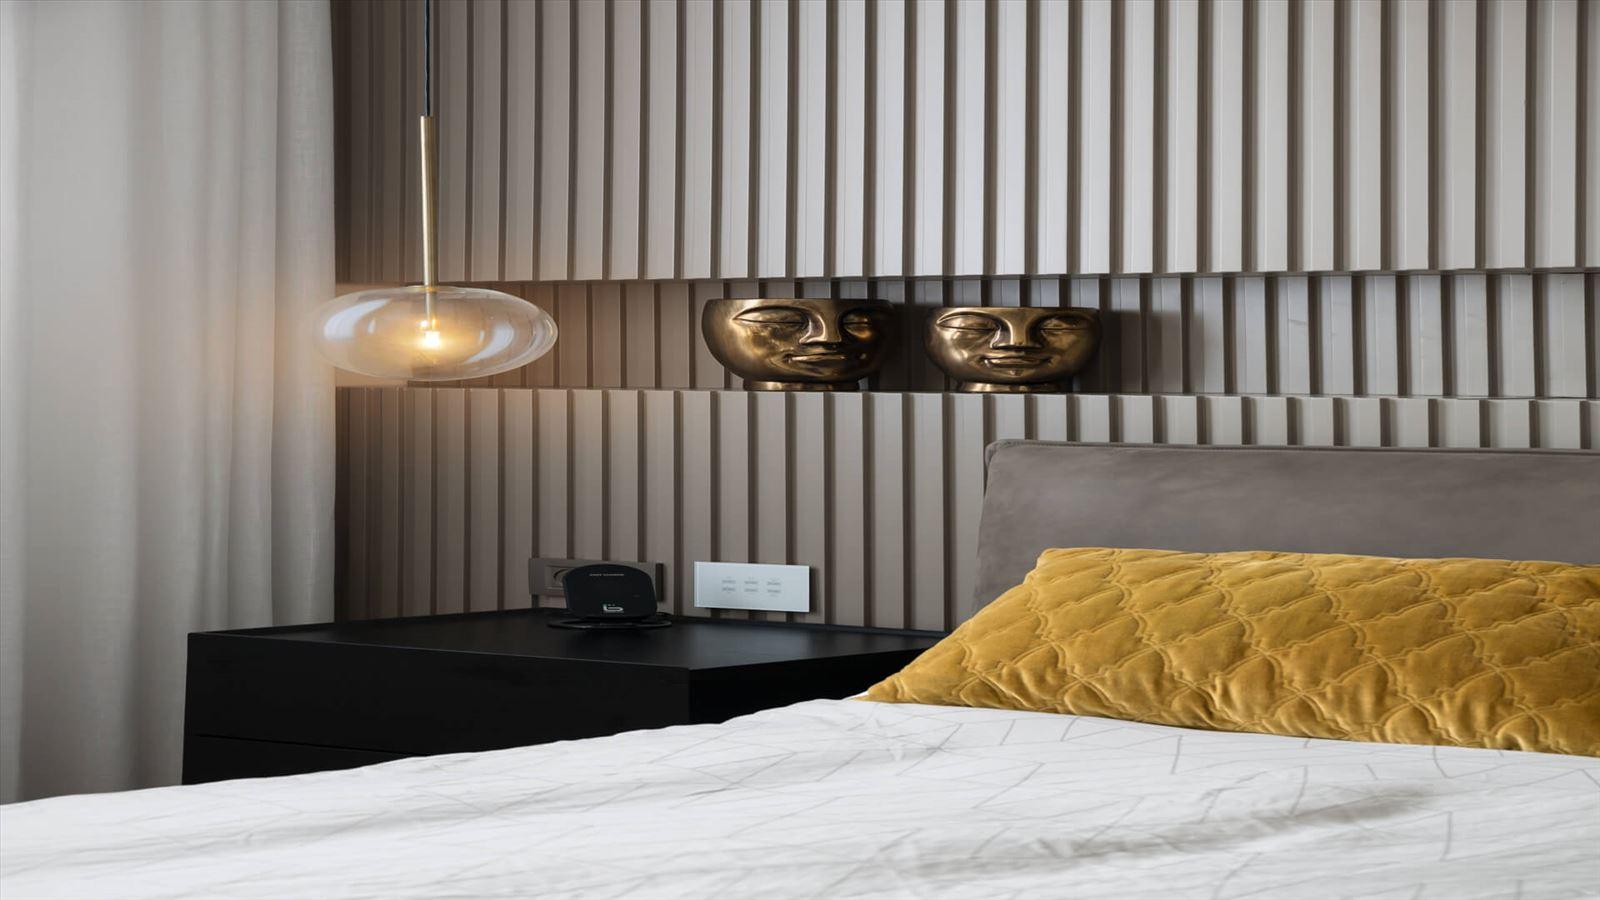 Penthouse Carmelit - תאורה מעוצבת על ידי קמחי תאורה